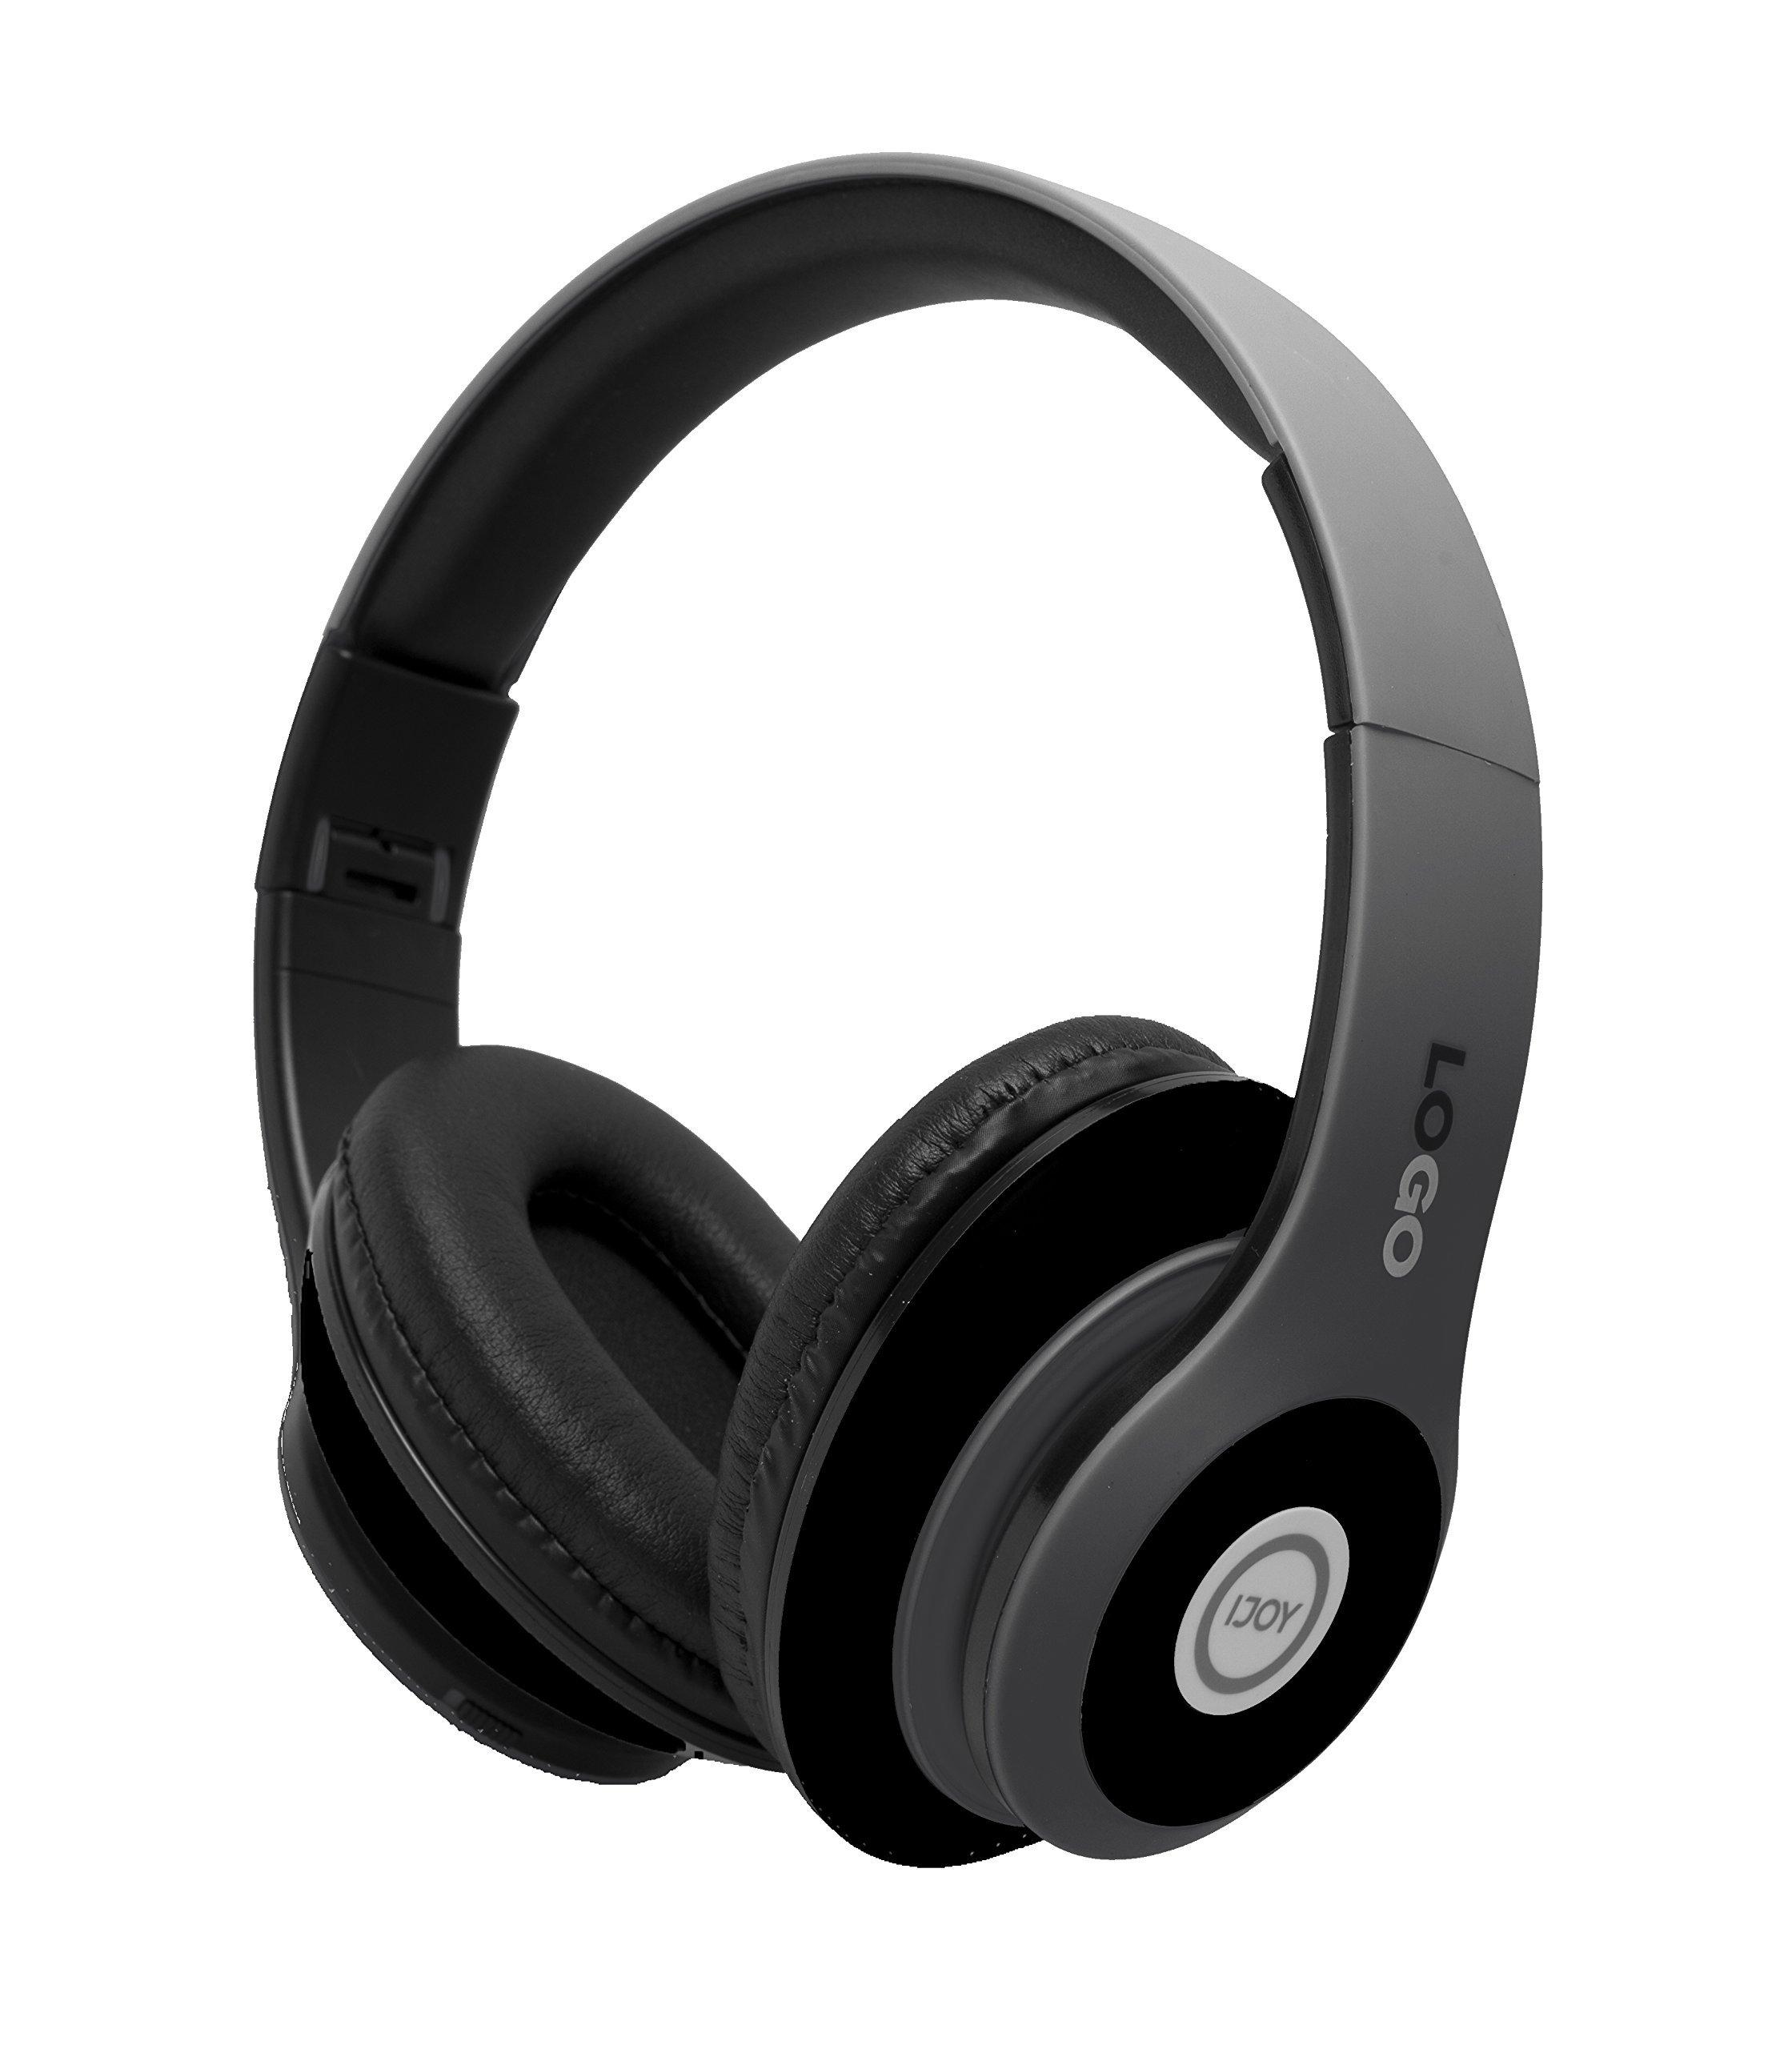 iJoy Rechargeable Wireless Headphones Bluetooth